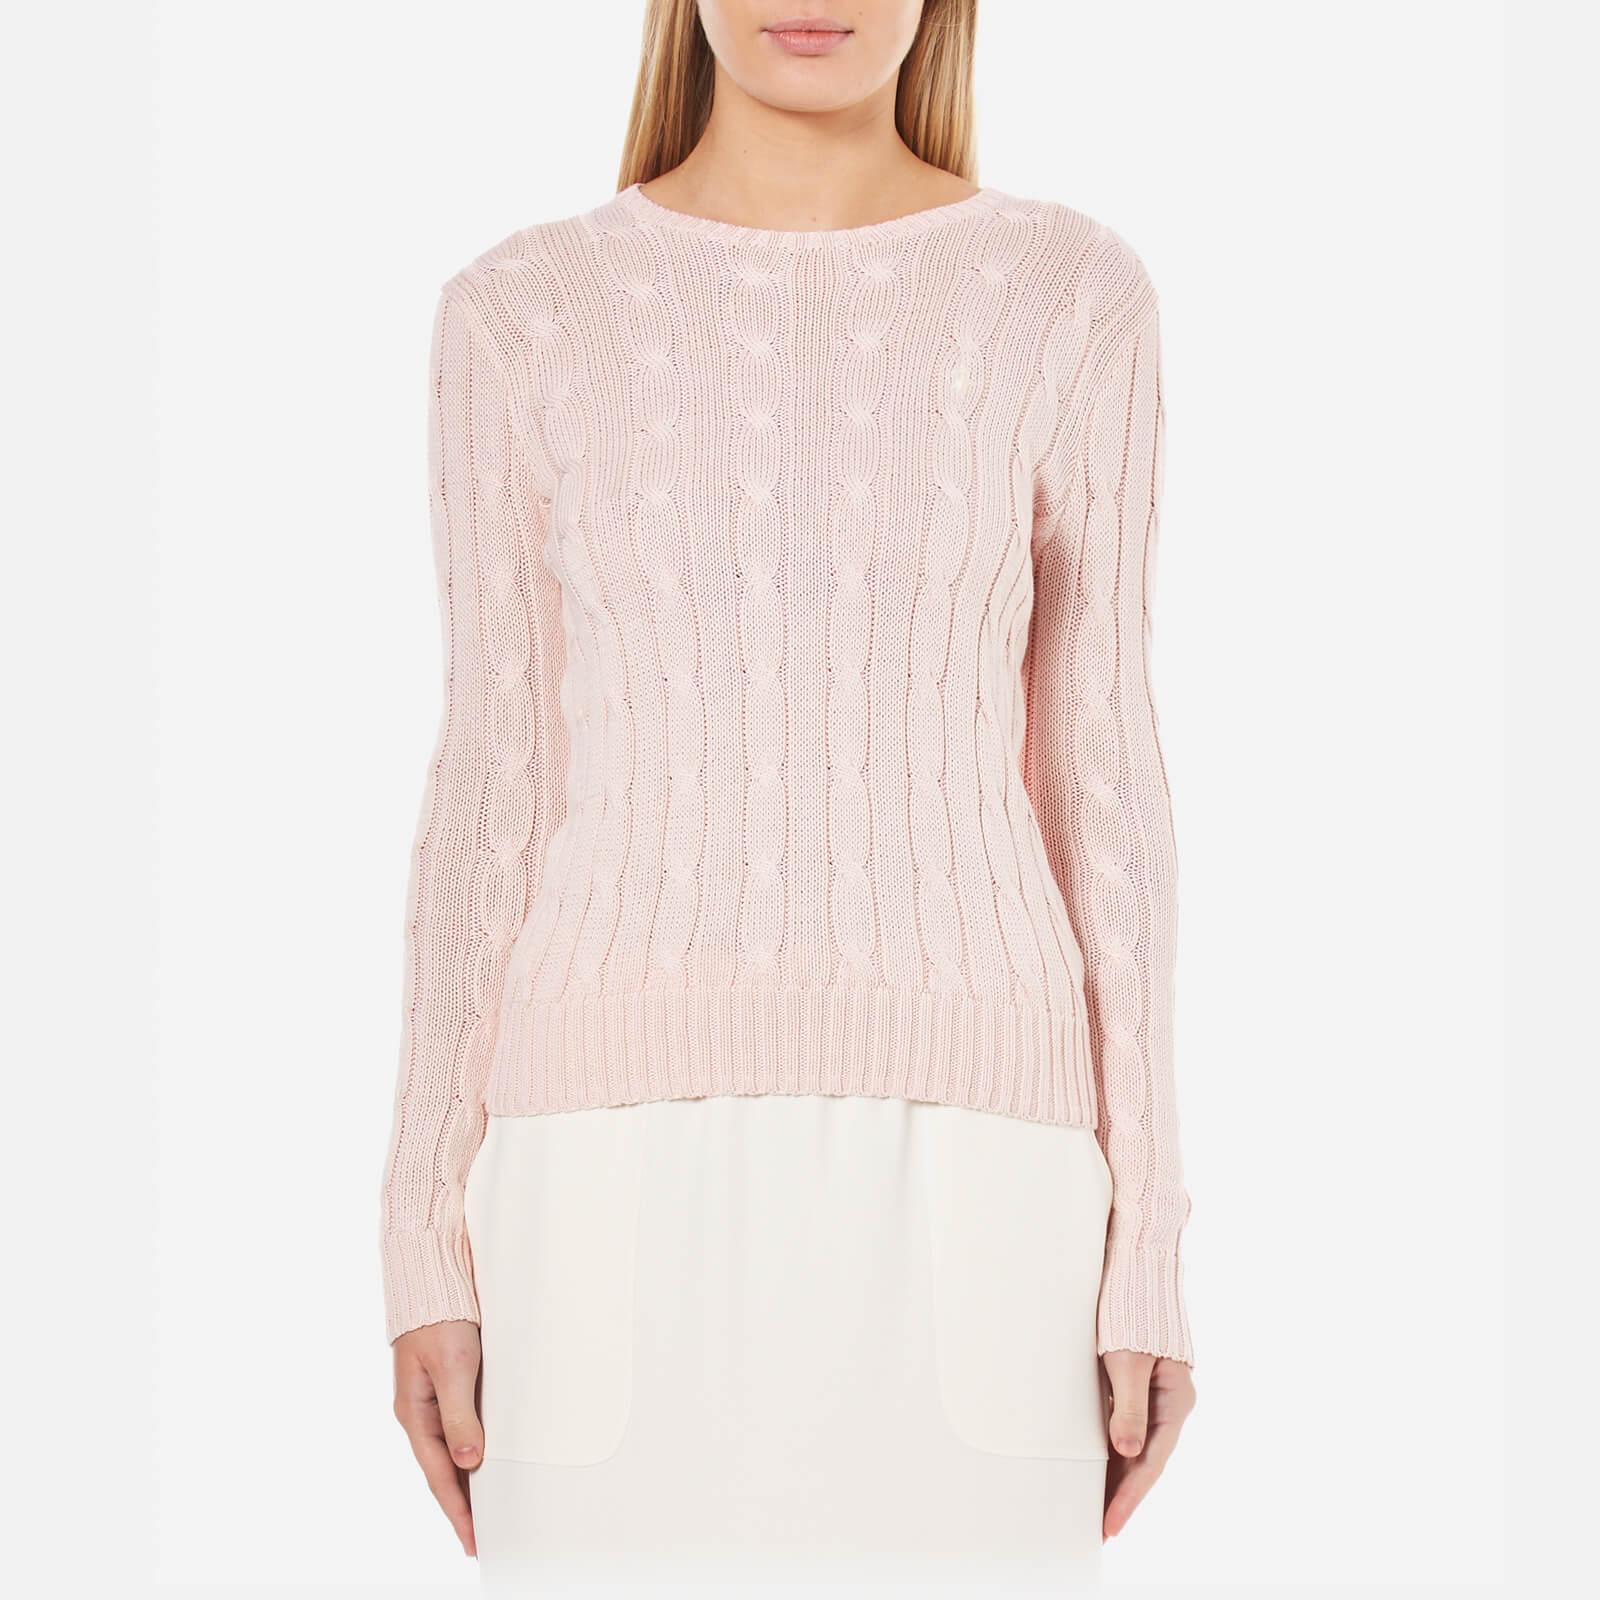 86f88cc2346e Polo Ralph Lauren Women's Julianna Jumper - Cloud Pink - Free UK Delivery  over £50